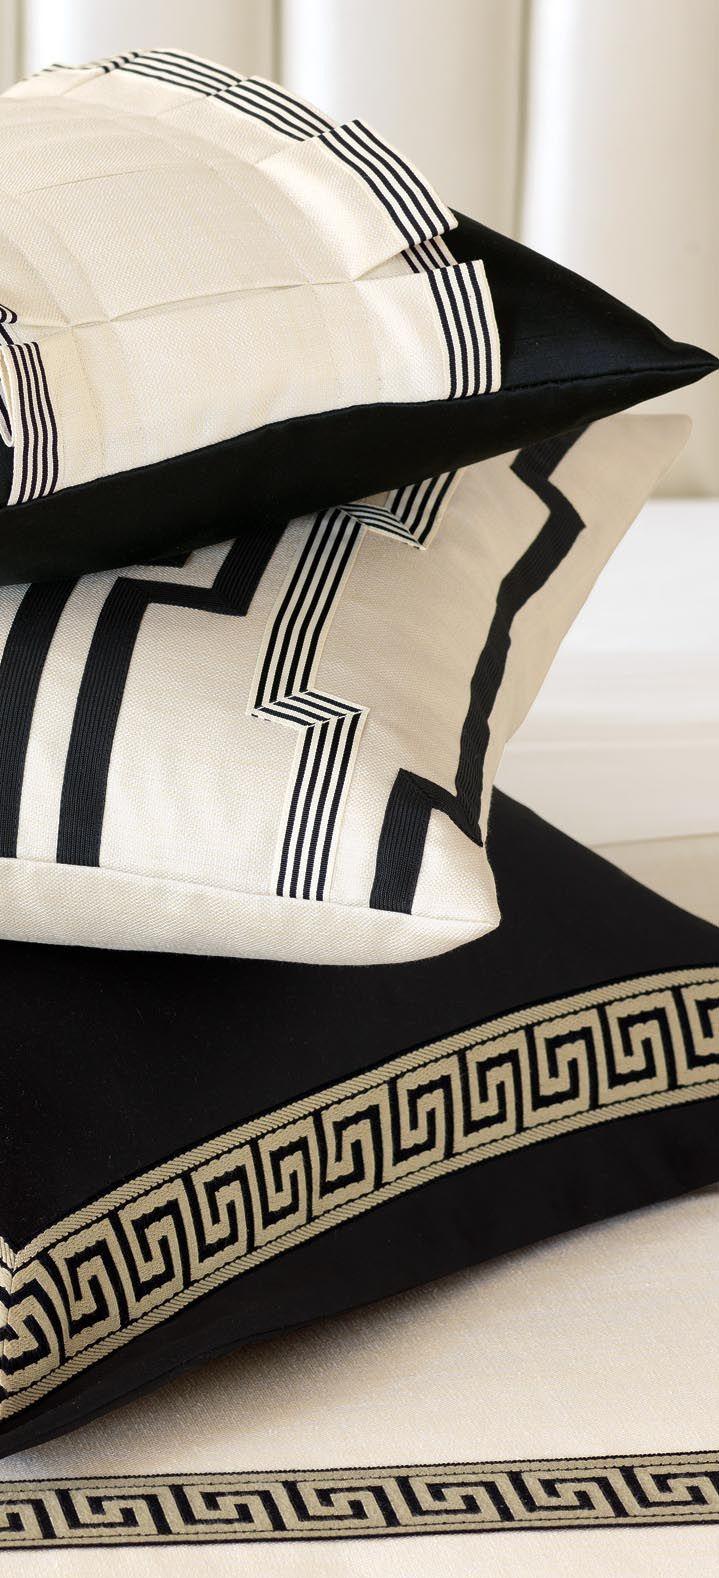 Uncategorized/luxury designer bedding/abernathy - Eastern Accents Abernathy Bedding